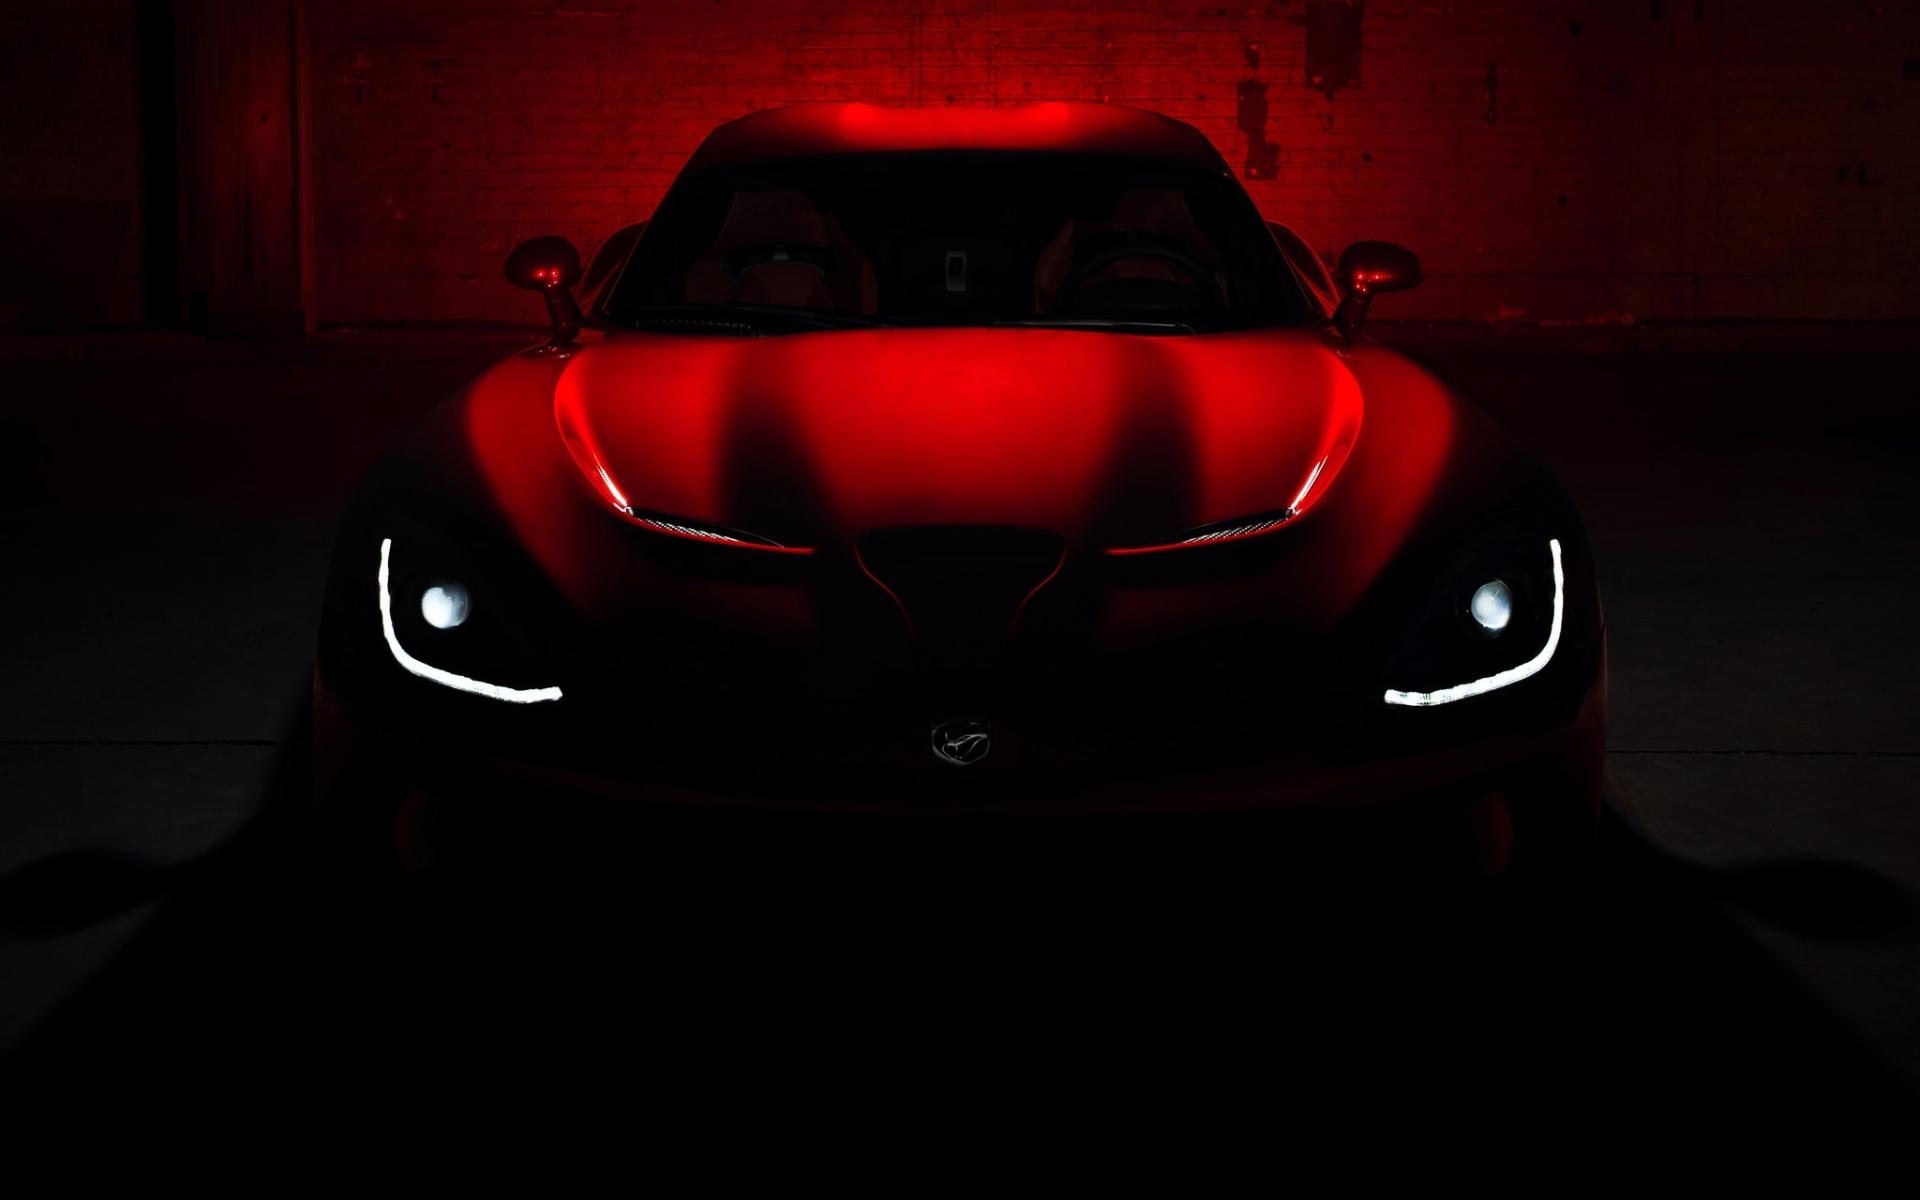 Dodge Srt Viper Gts Vehicles Cars Concept Red Glow Dark